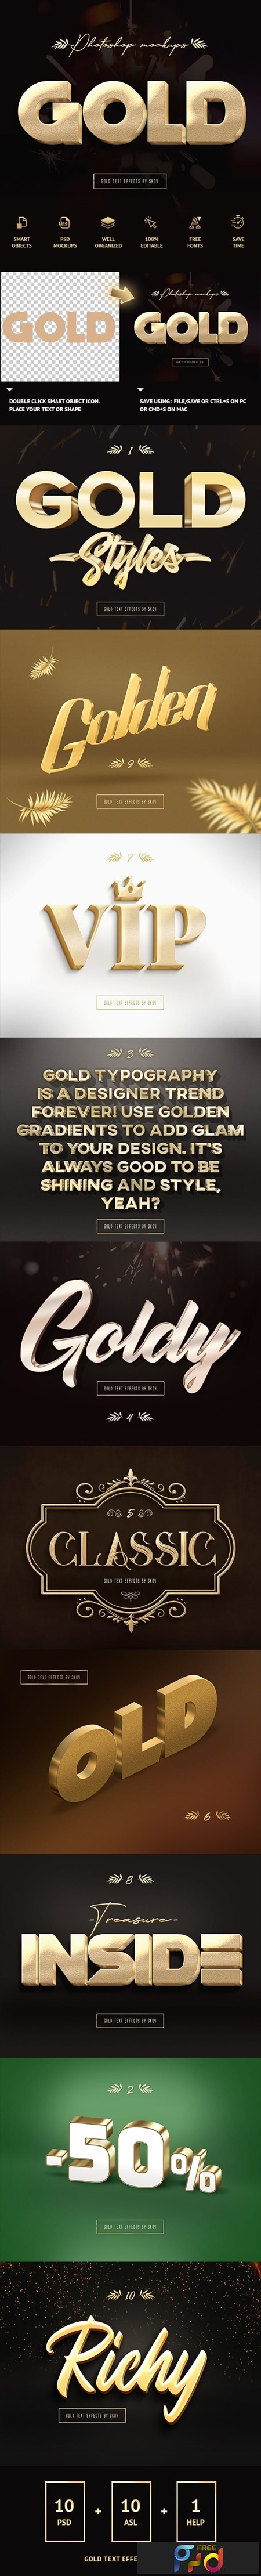 3D Gold Text Effects 23653176 - FreePSDvn